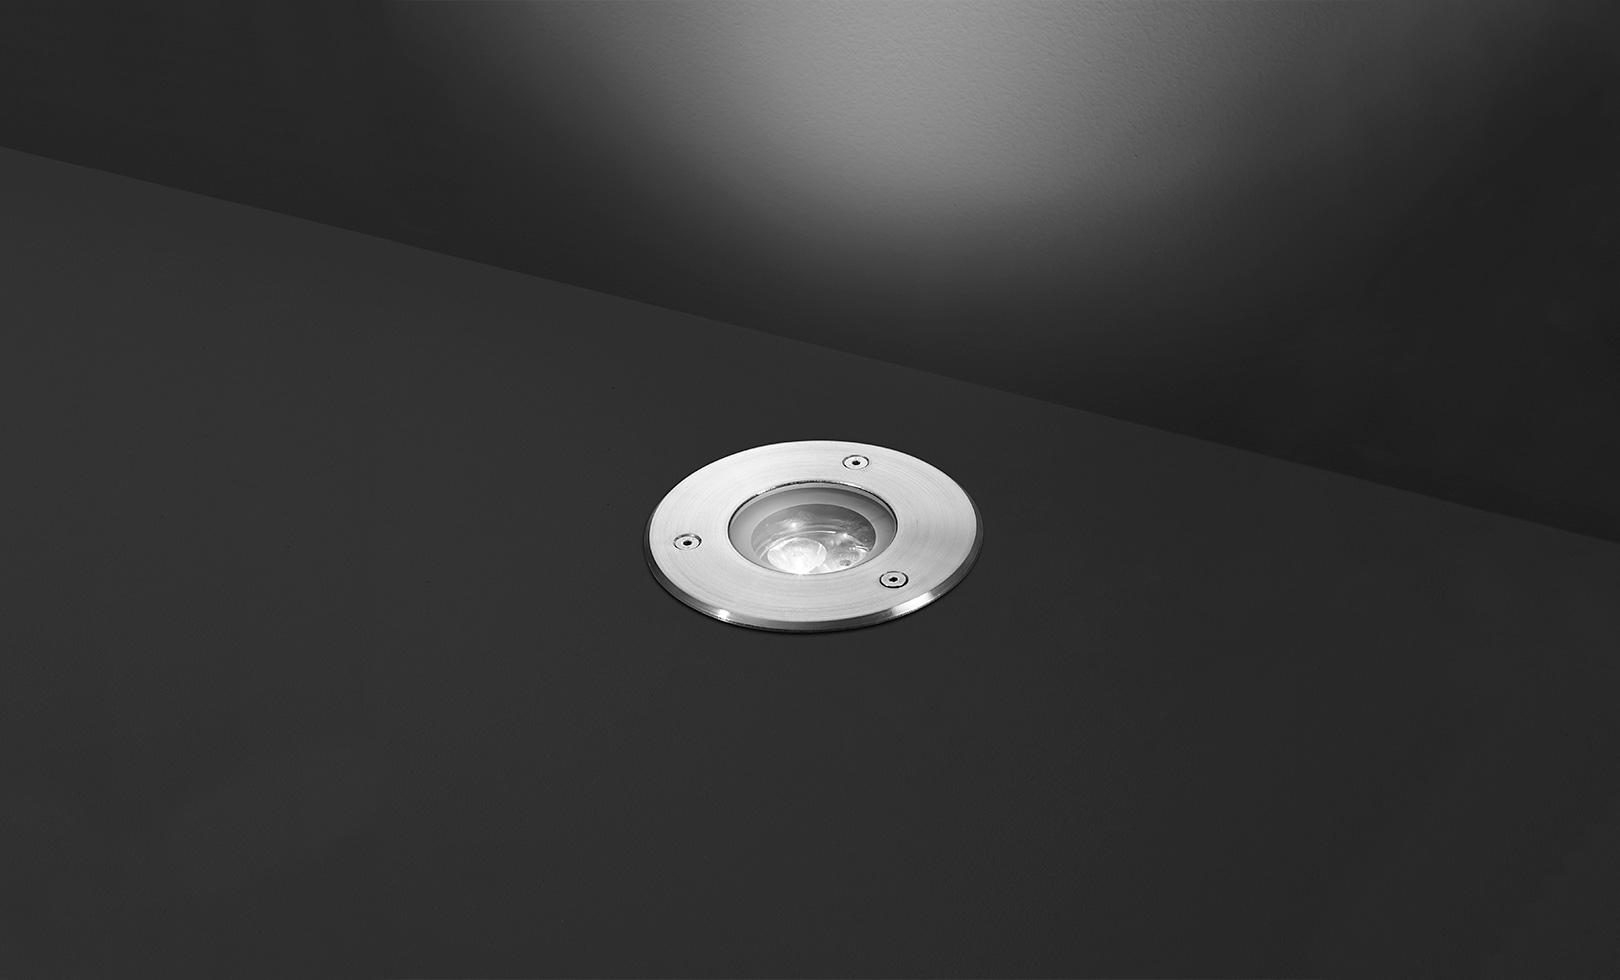 201012 HYDROFLOOR MINI LED 3W 1